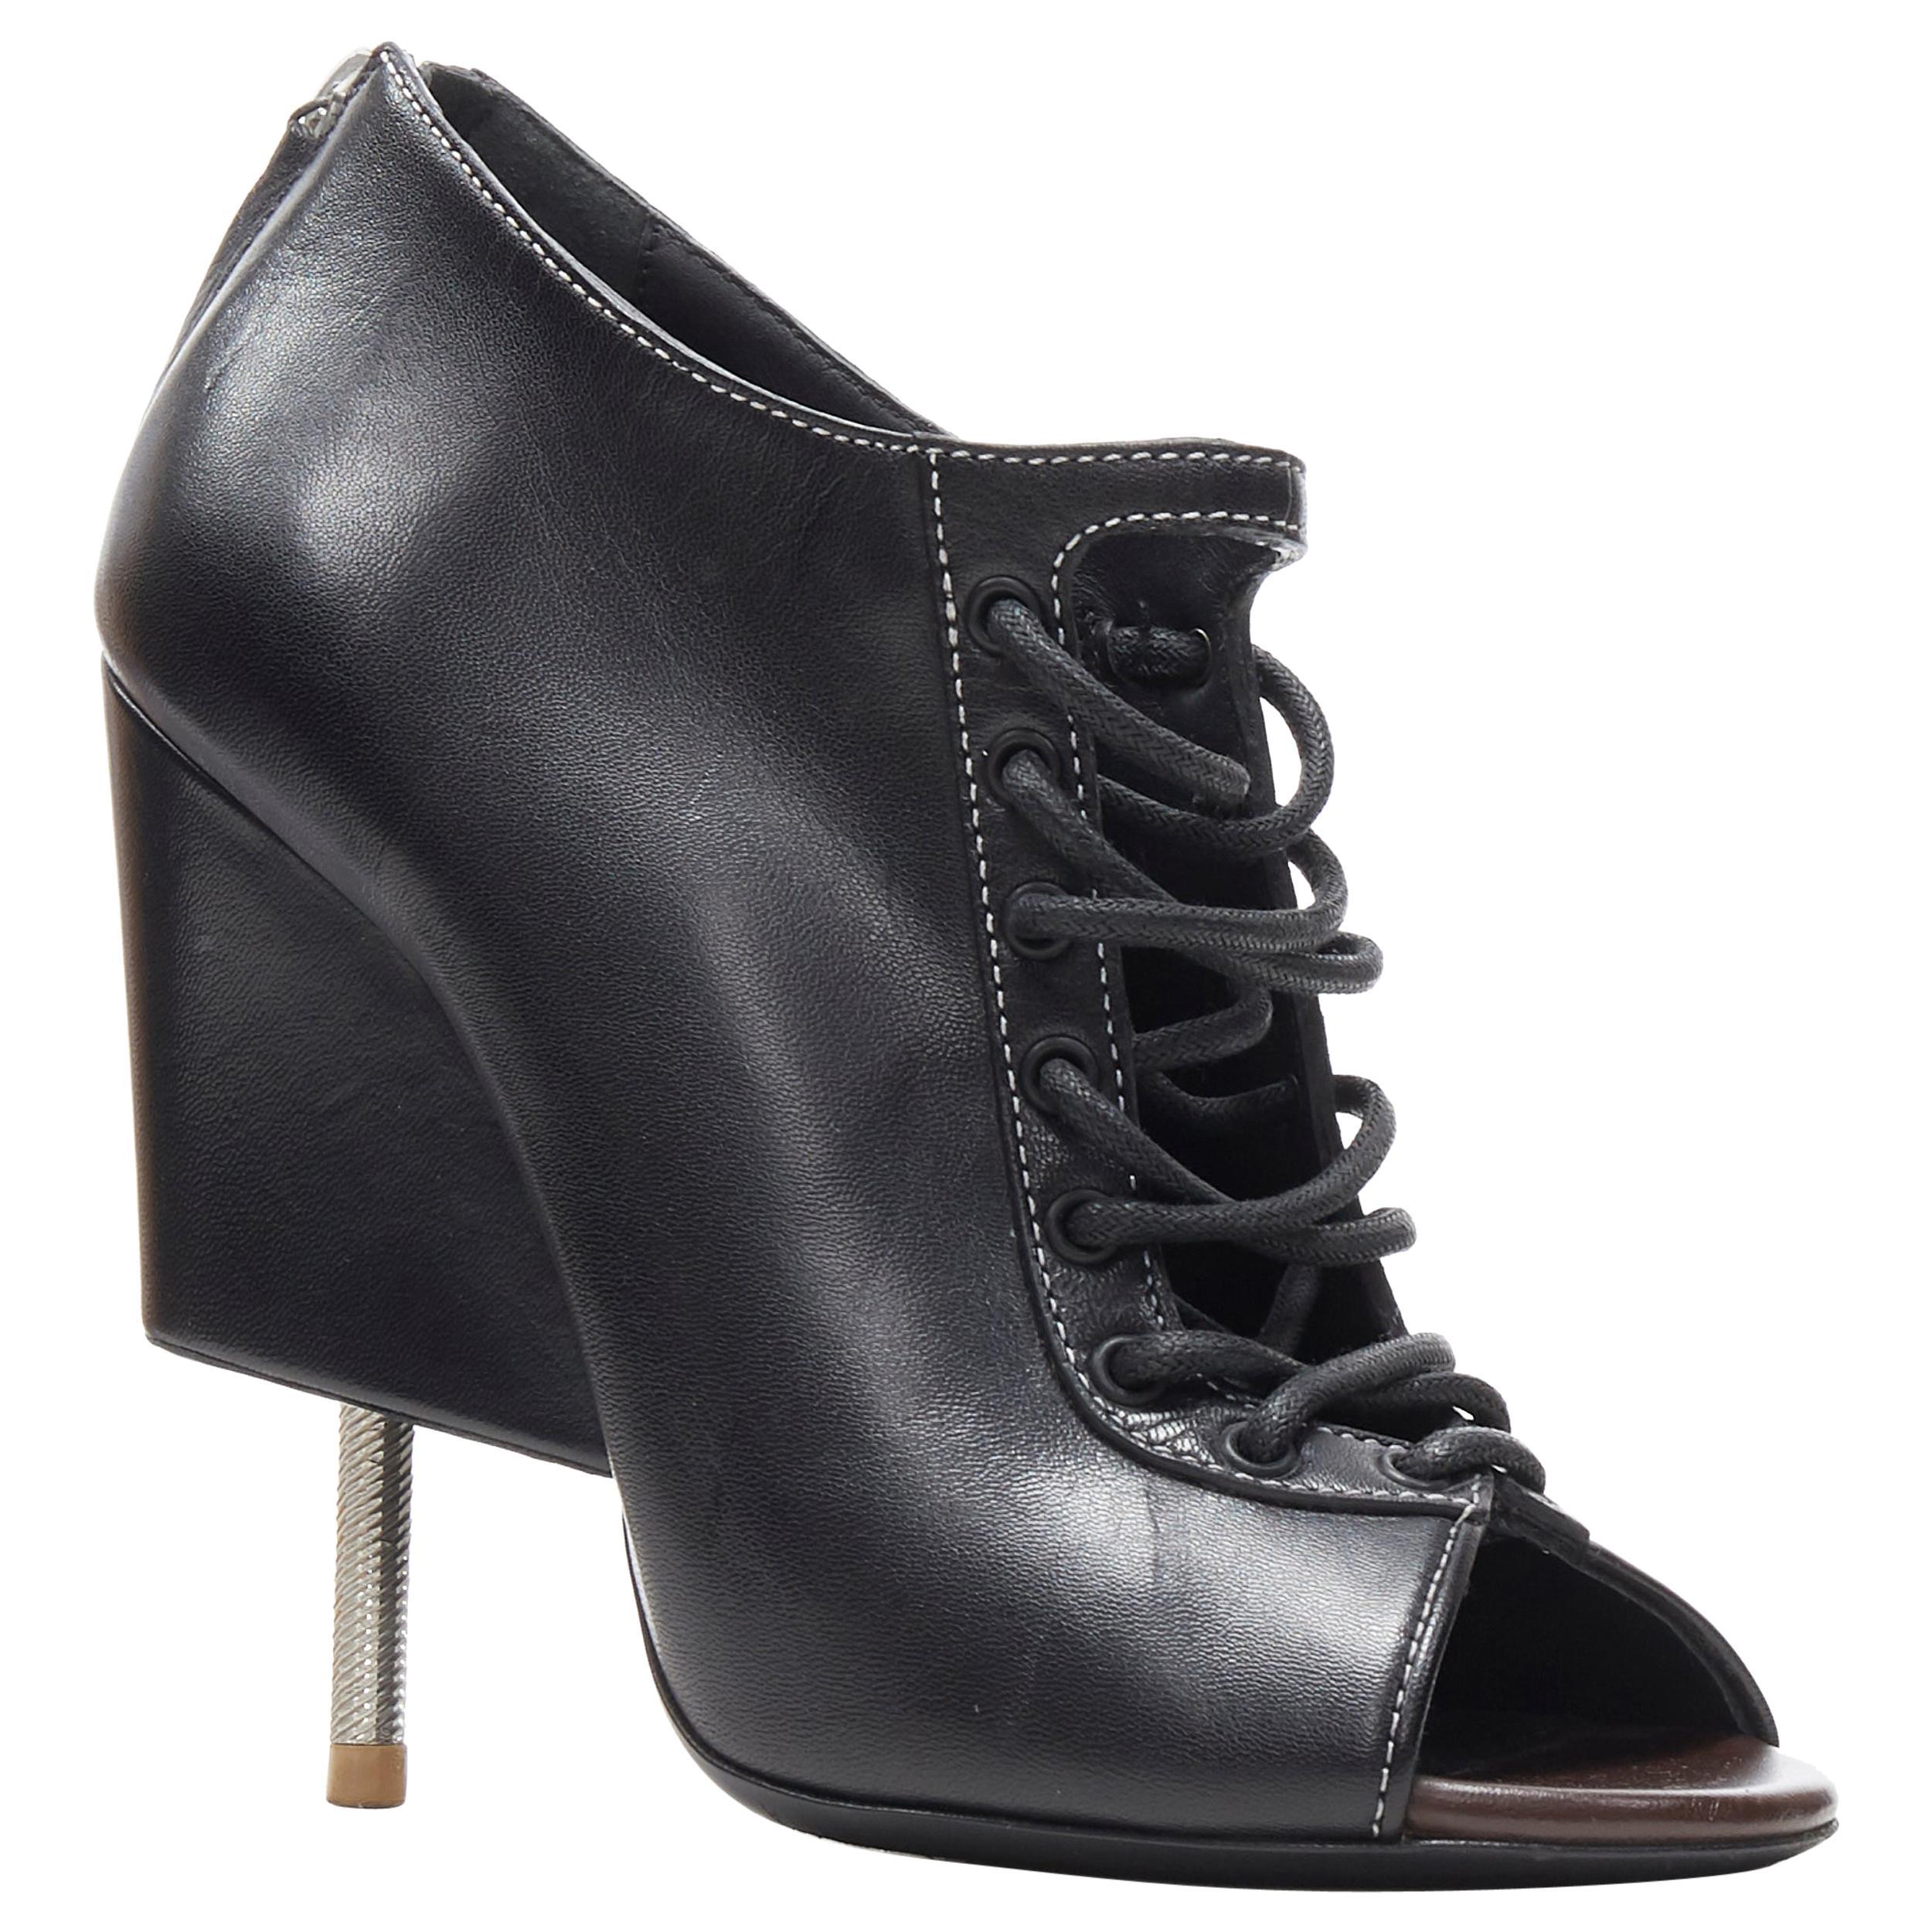 runway GIVENCHY TISCI black lace up open toe angular nail heel bootie EU38